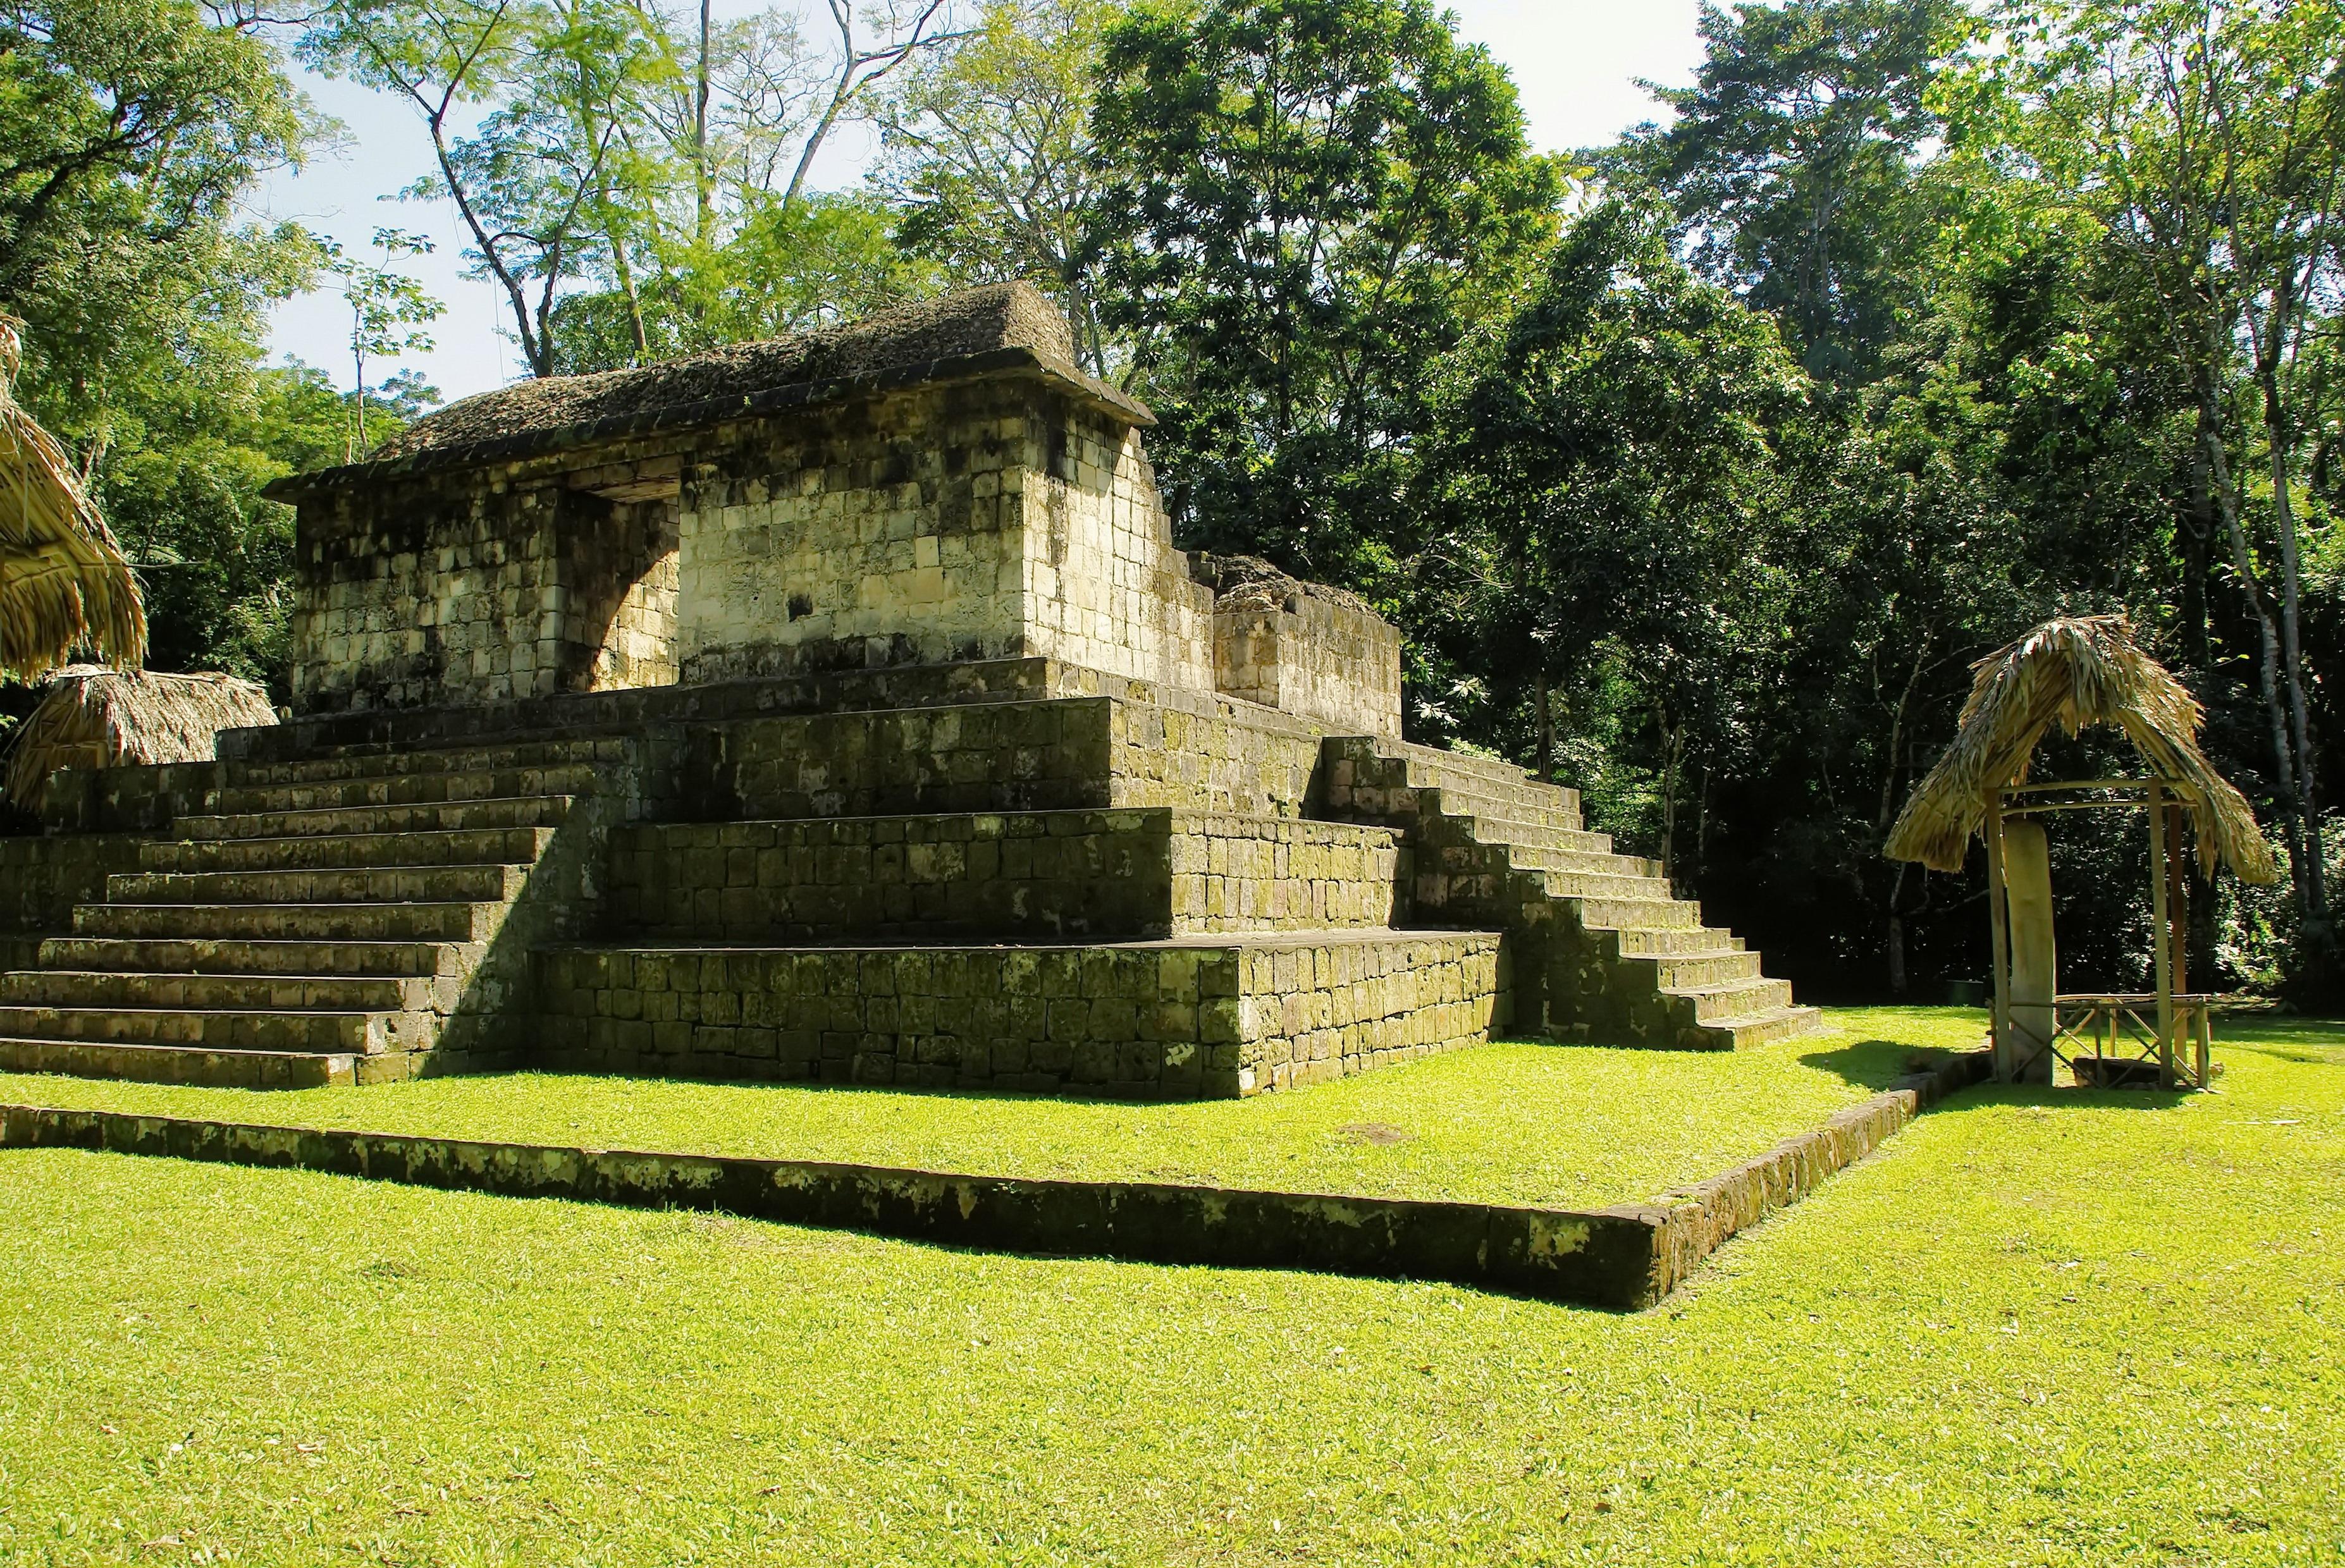 Lawn Pyramid Garden Ruins Rainforest Estate Maya Guatemala Archaeological  Site Sayaxche Ceibal